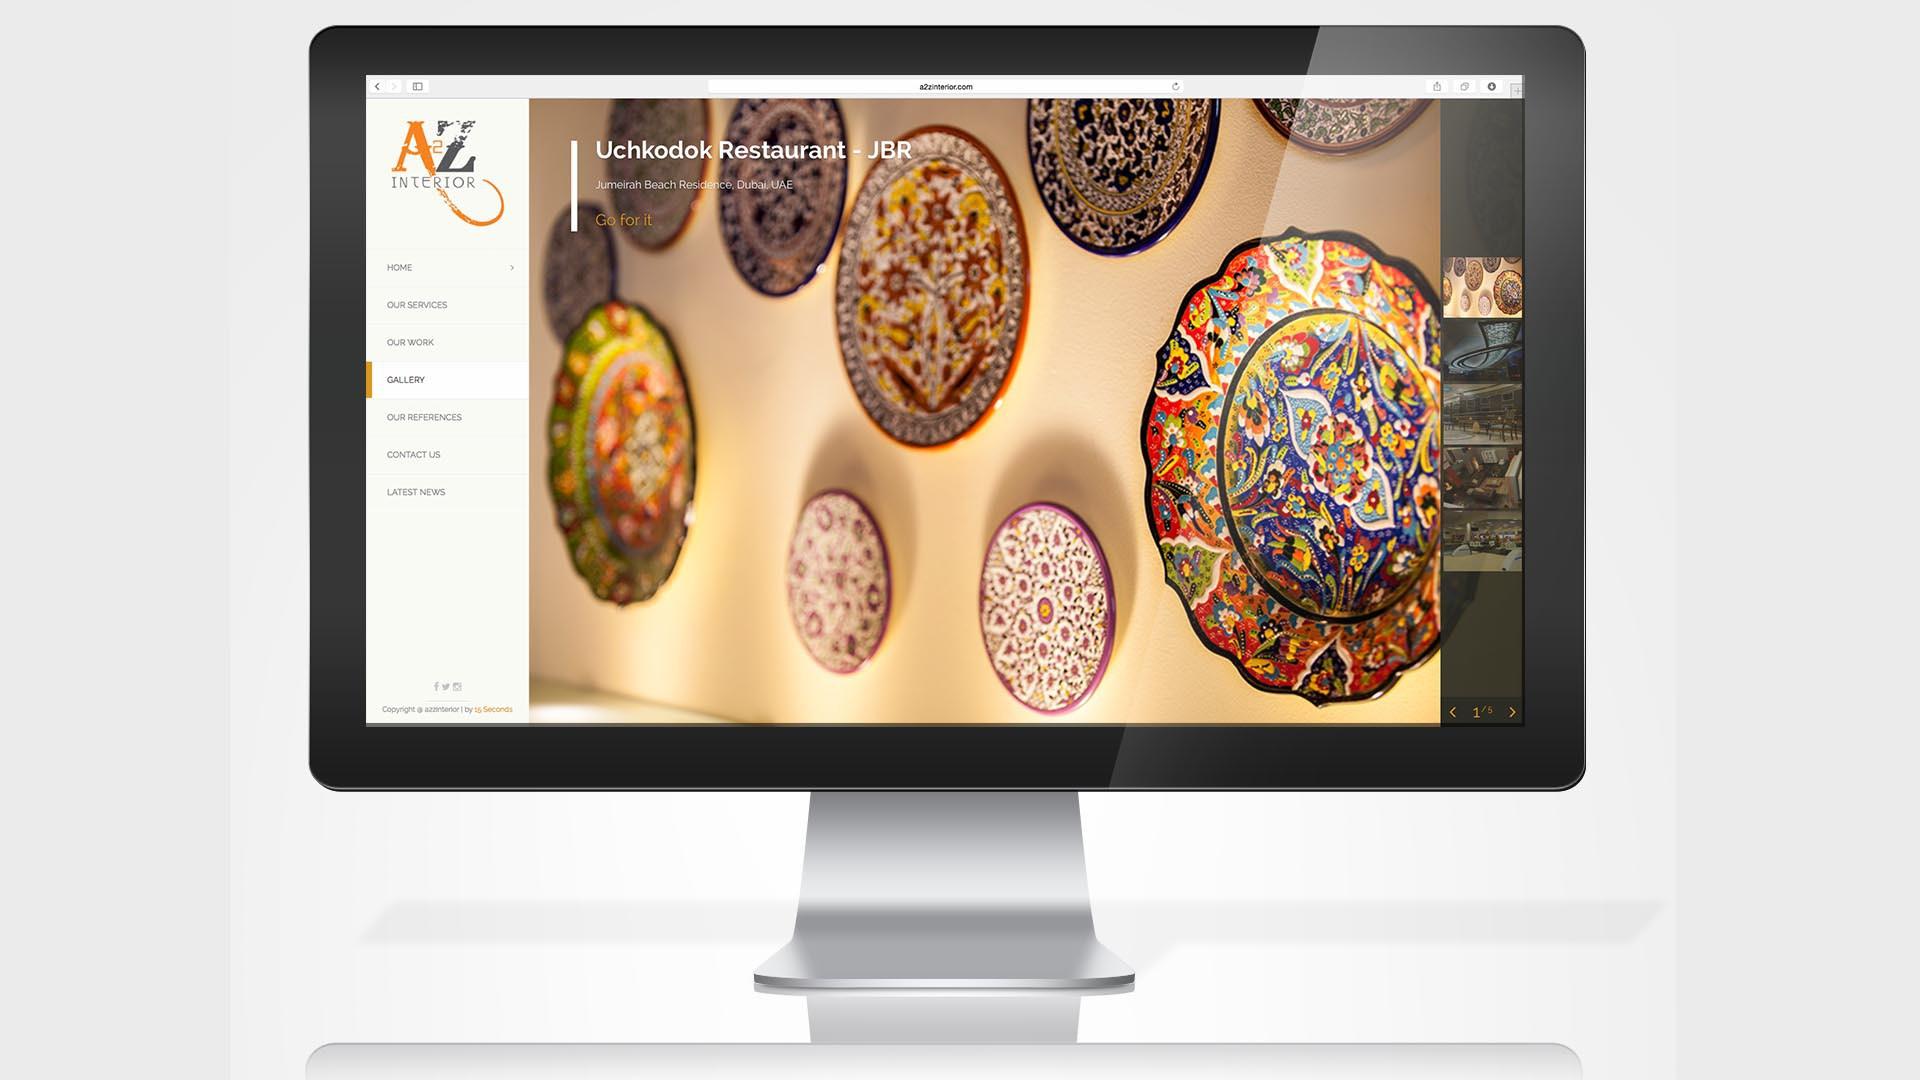 a2z-interiors-website-gallery